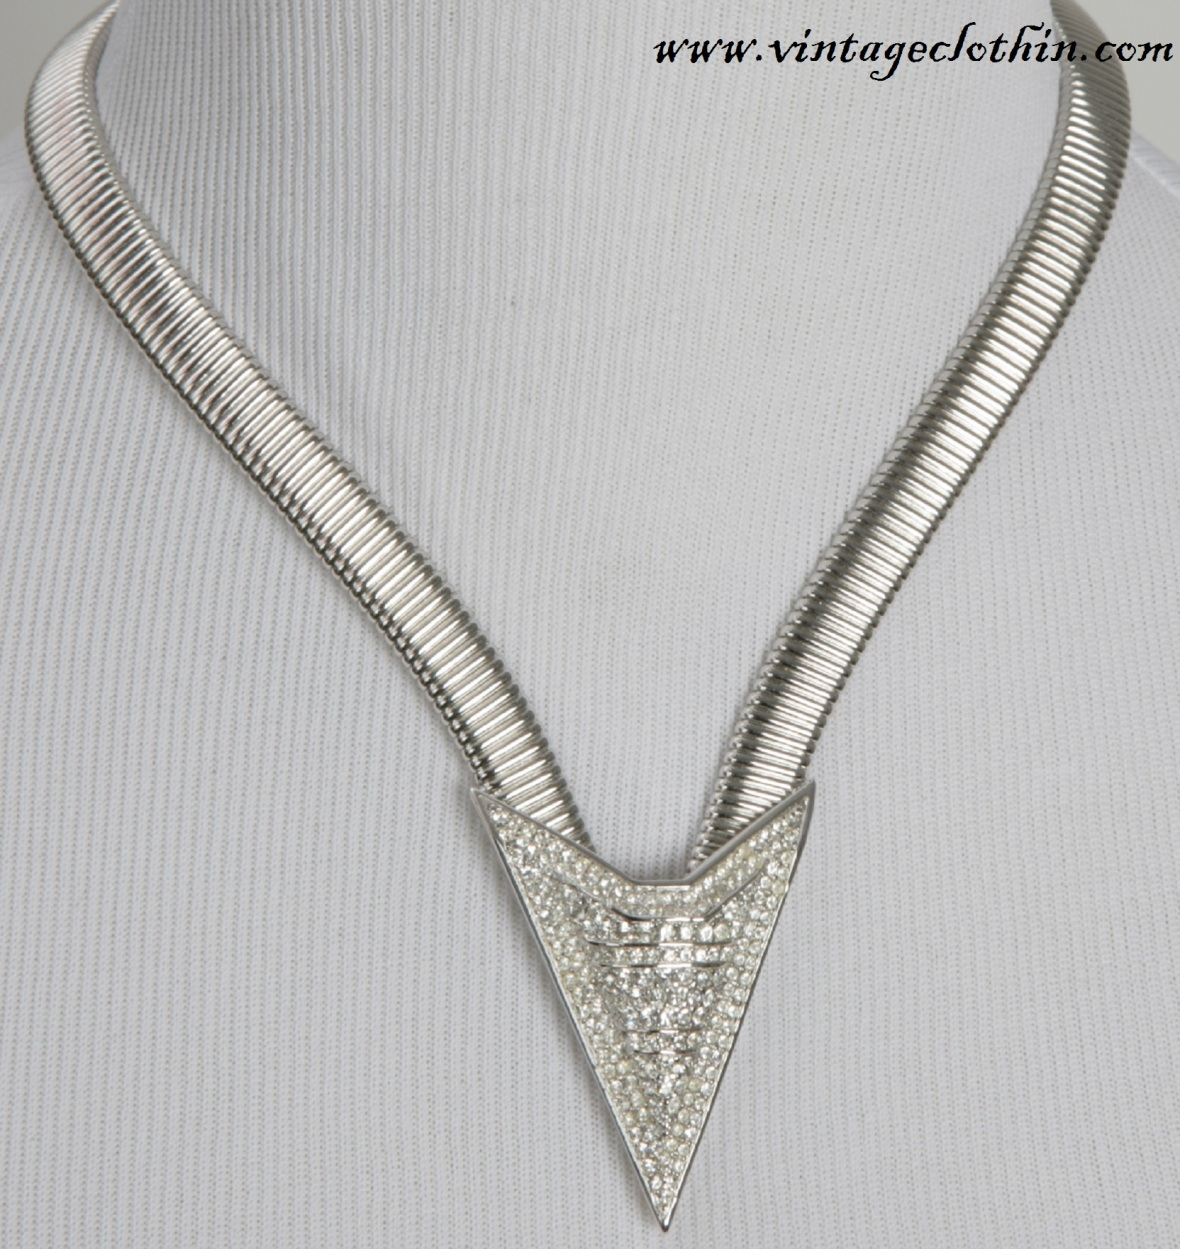 Christian Dior Necklace, Necklace, vintage Necklace, Dior, Dior Necklace, 1980s necklace, 1980s, 80s necklace,